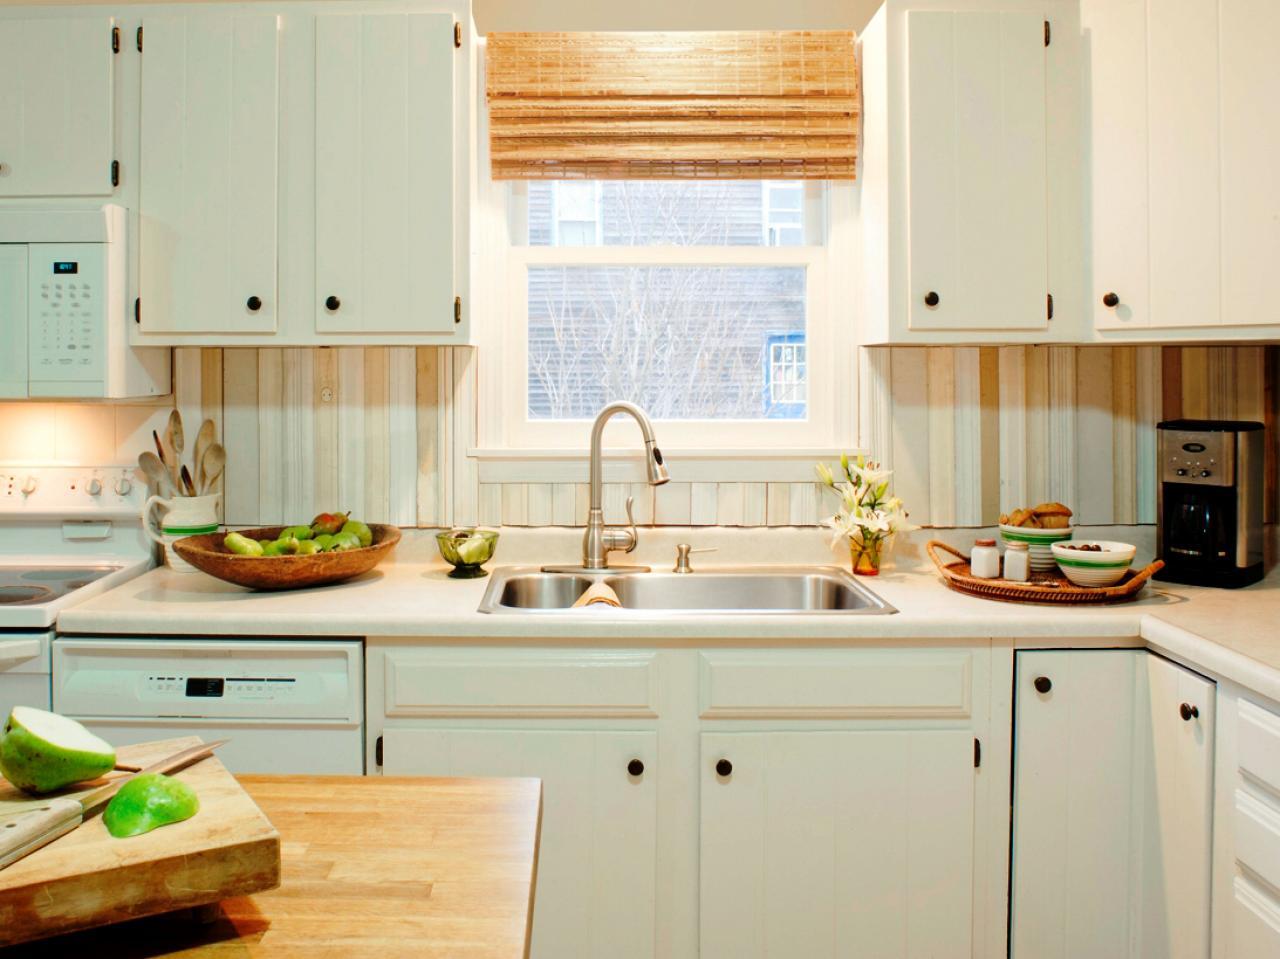 Vertical wood -style kitchen backsplash.